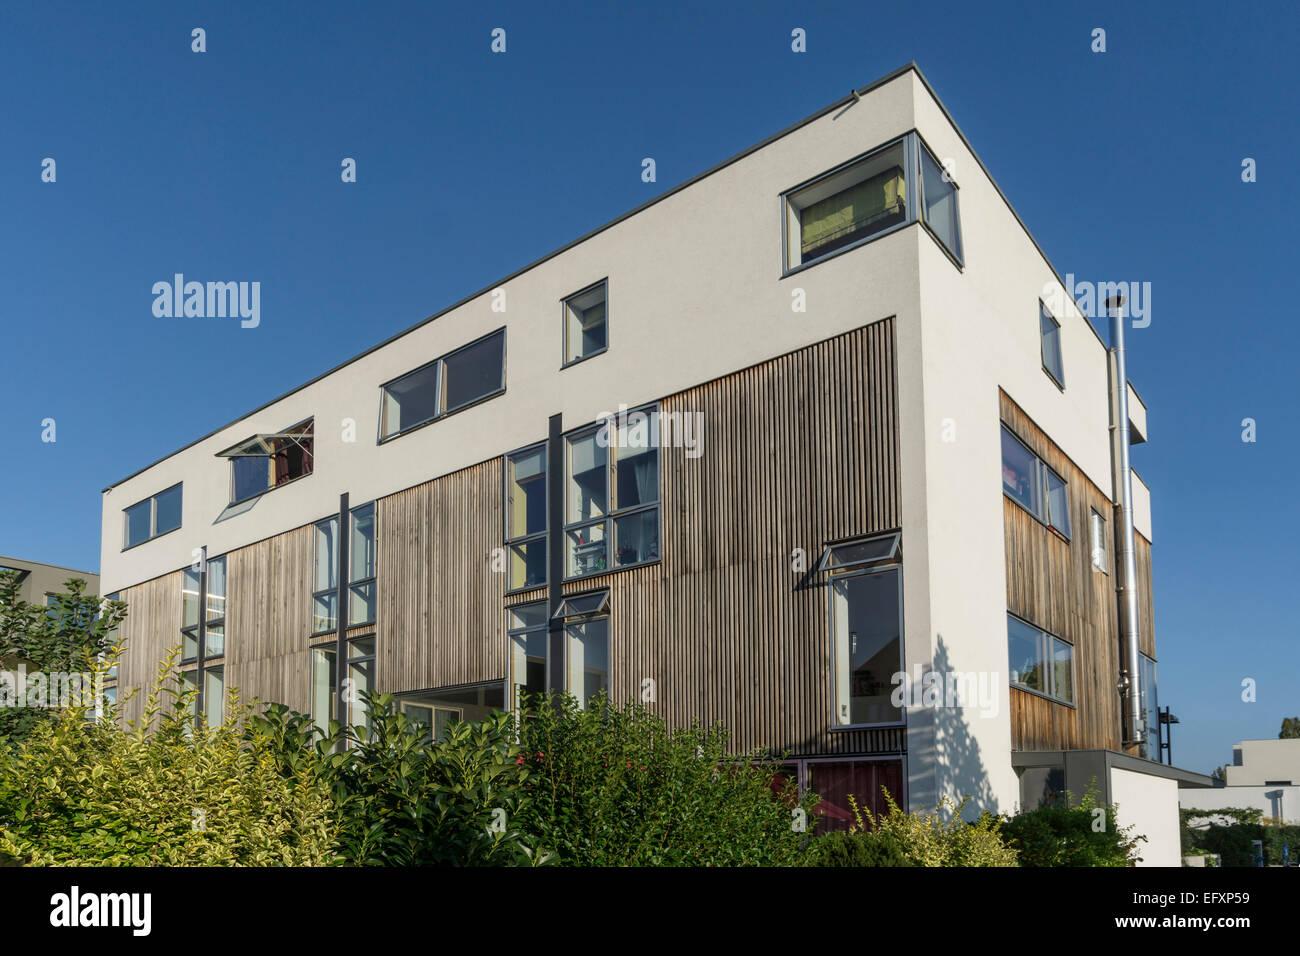 La arquitectura moderna, Inmobiliaria, Rummelsburger Bucht, Berlín, Alemania Imagen De Stock